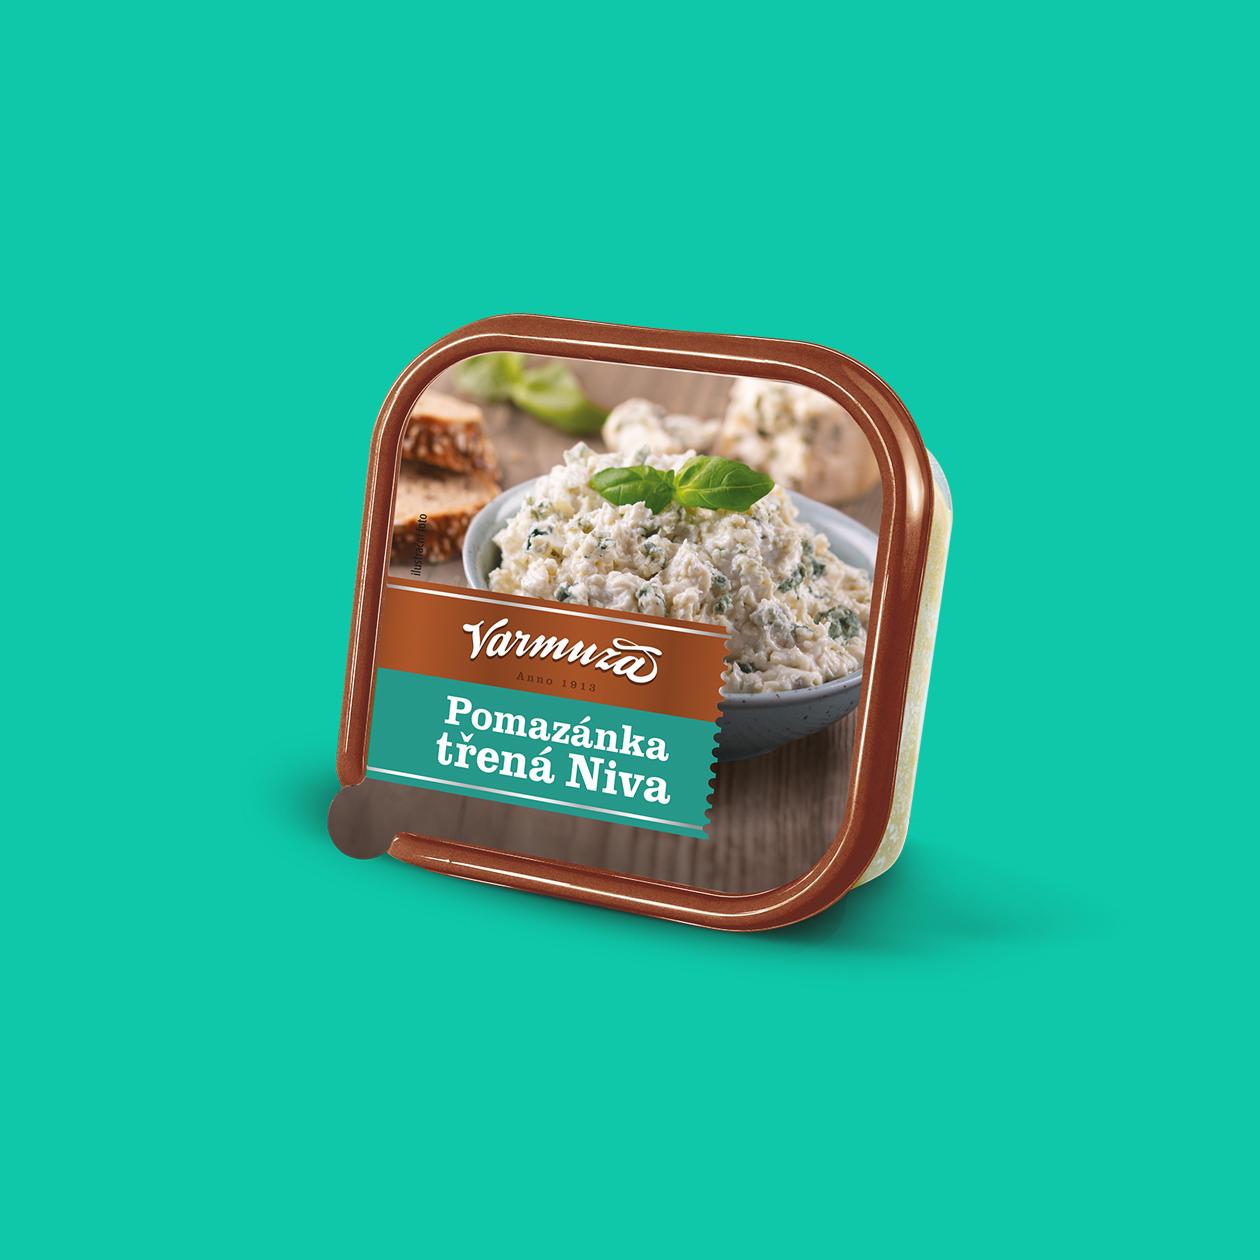 varmuza packaging